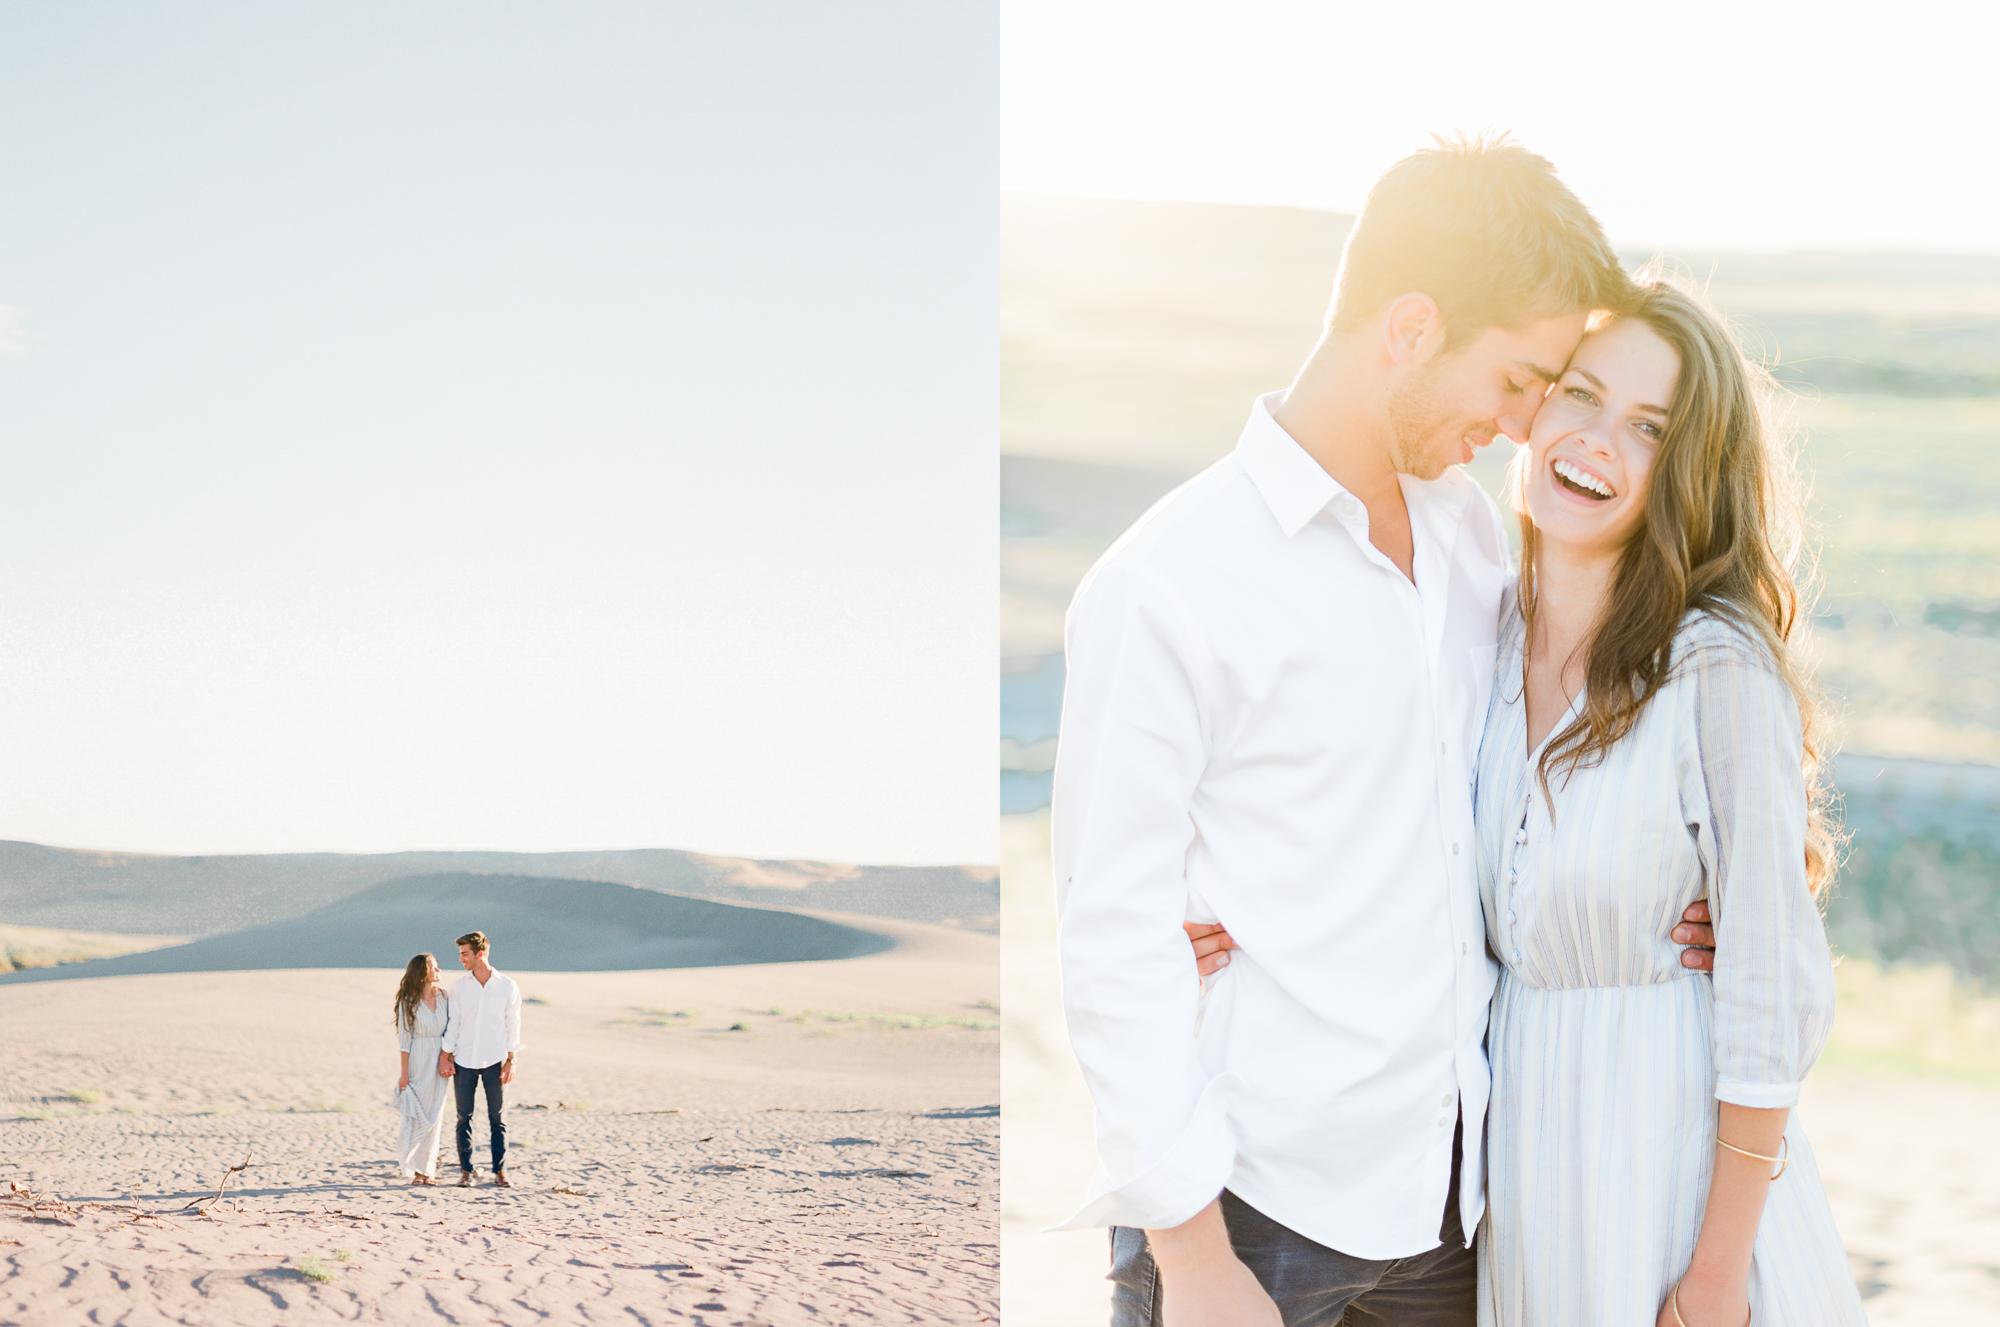 charlotte-charleston-wedding-family-film-destination-photographer-bruneau-sand-dunes-boise-idaho-1.jpg